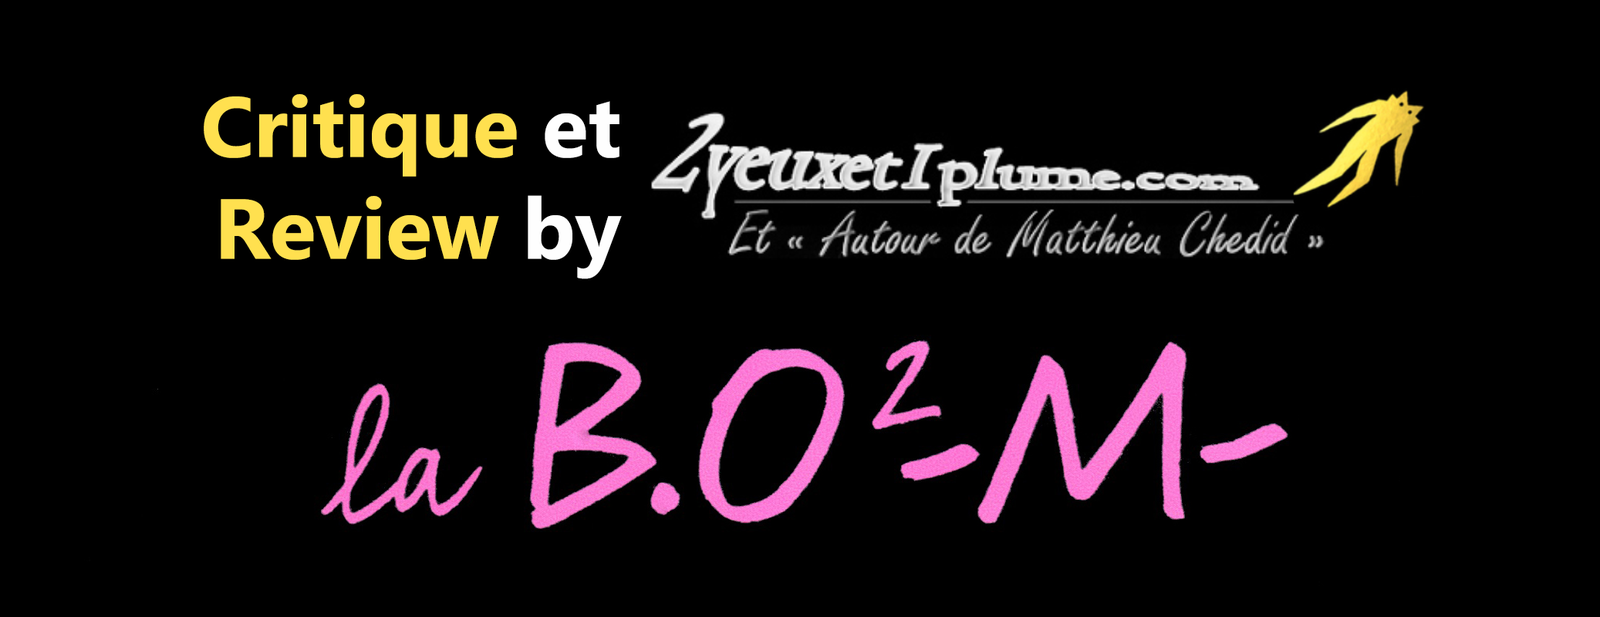 -M- Matthieu Chedid Critique Nouvel album 2015 La B.O² -M-